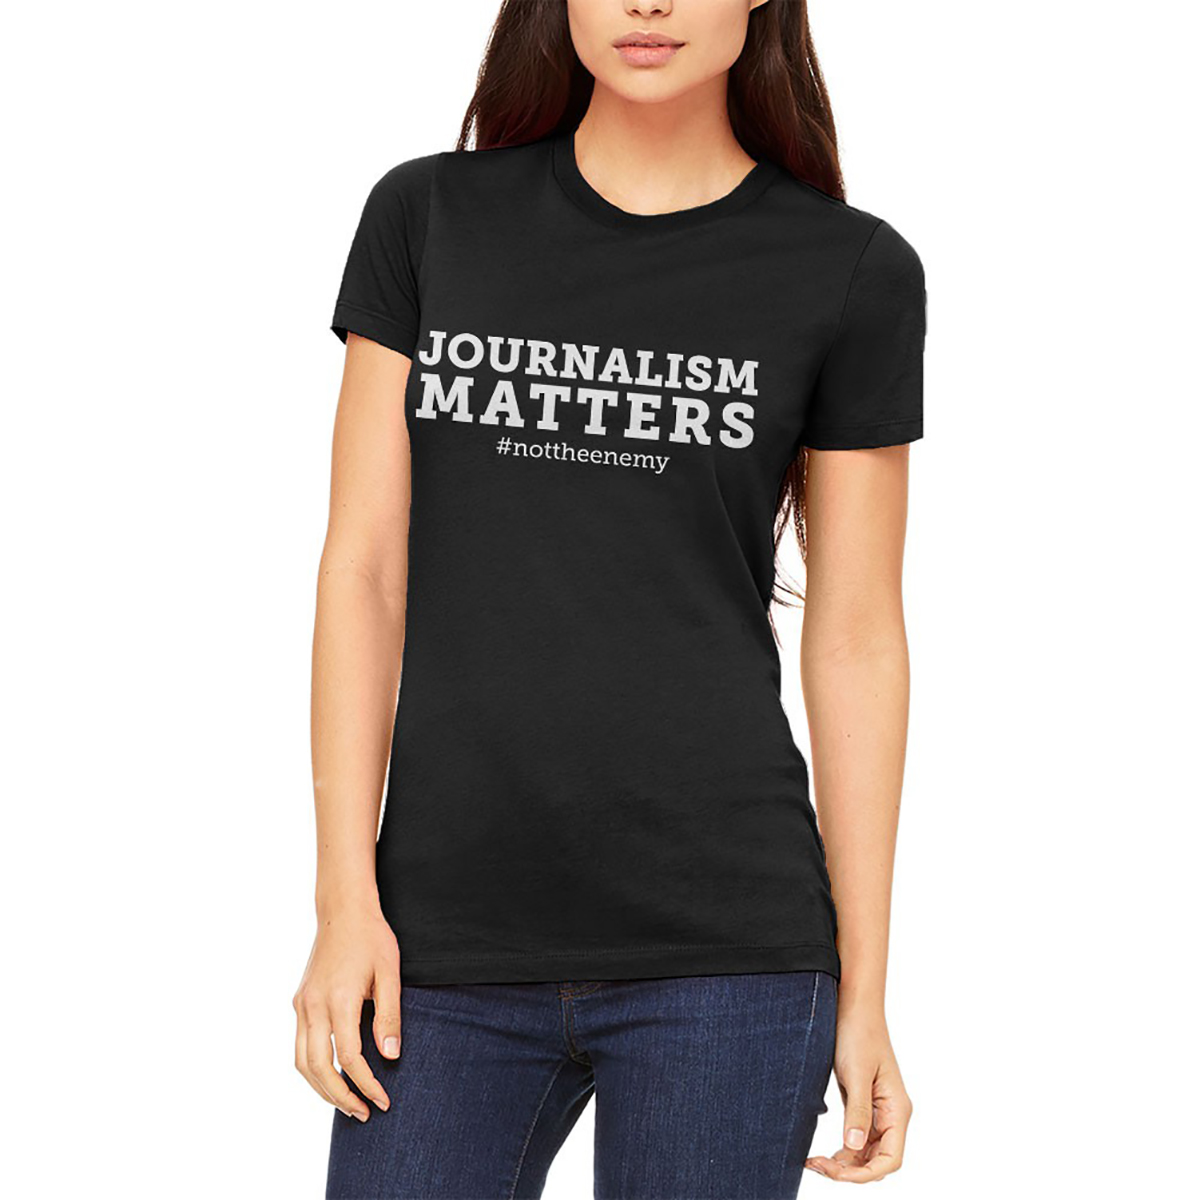 """Journalism Matters #nottheenemy"" Womens T-Shirt"